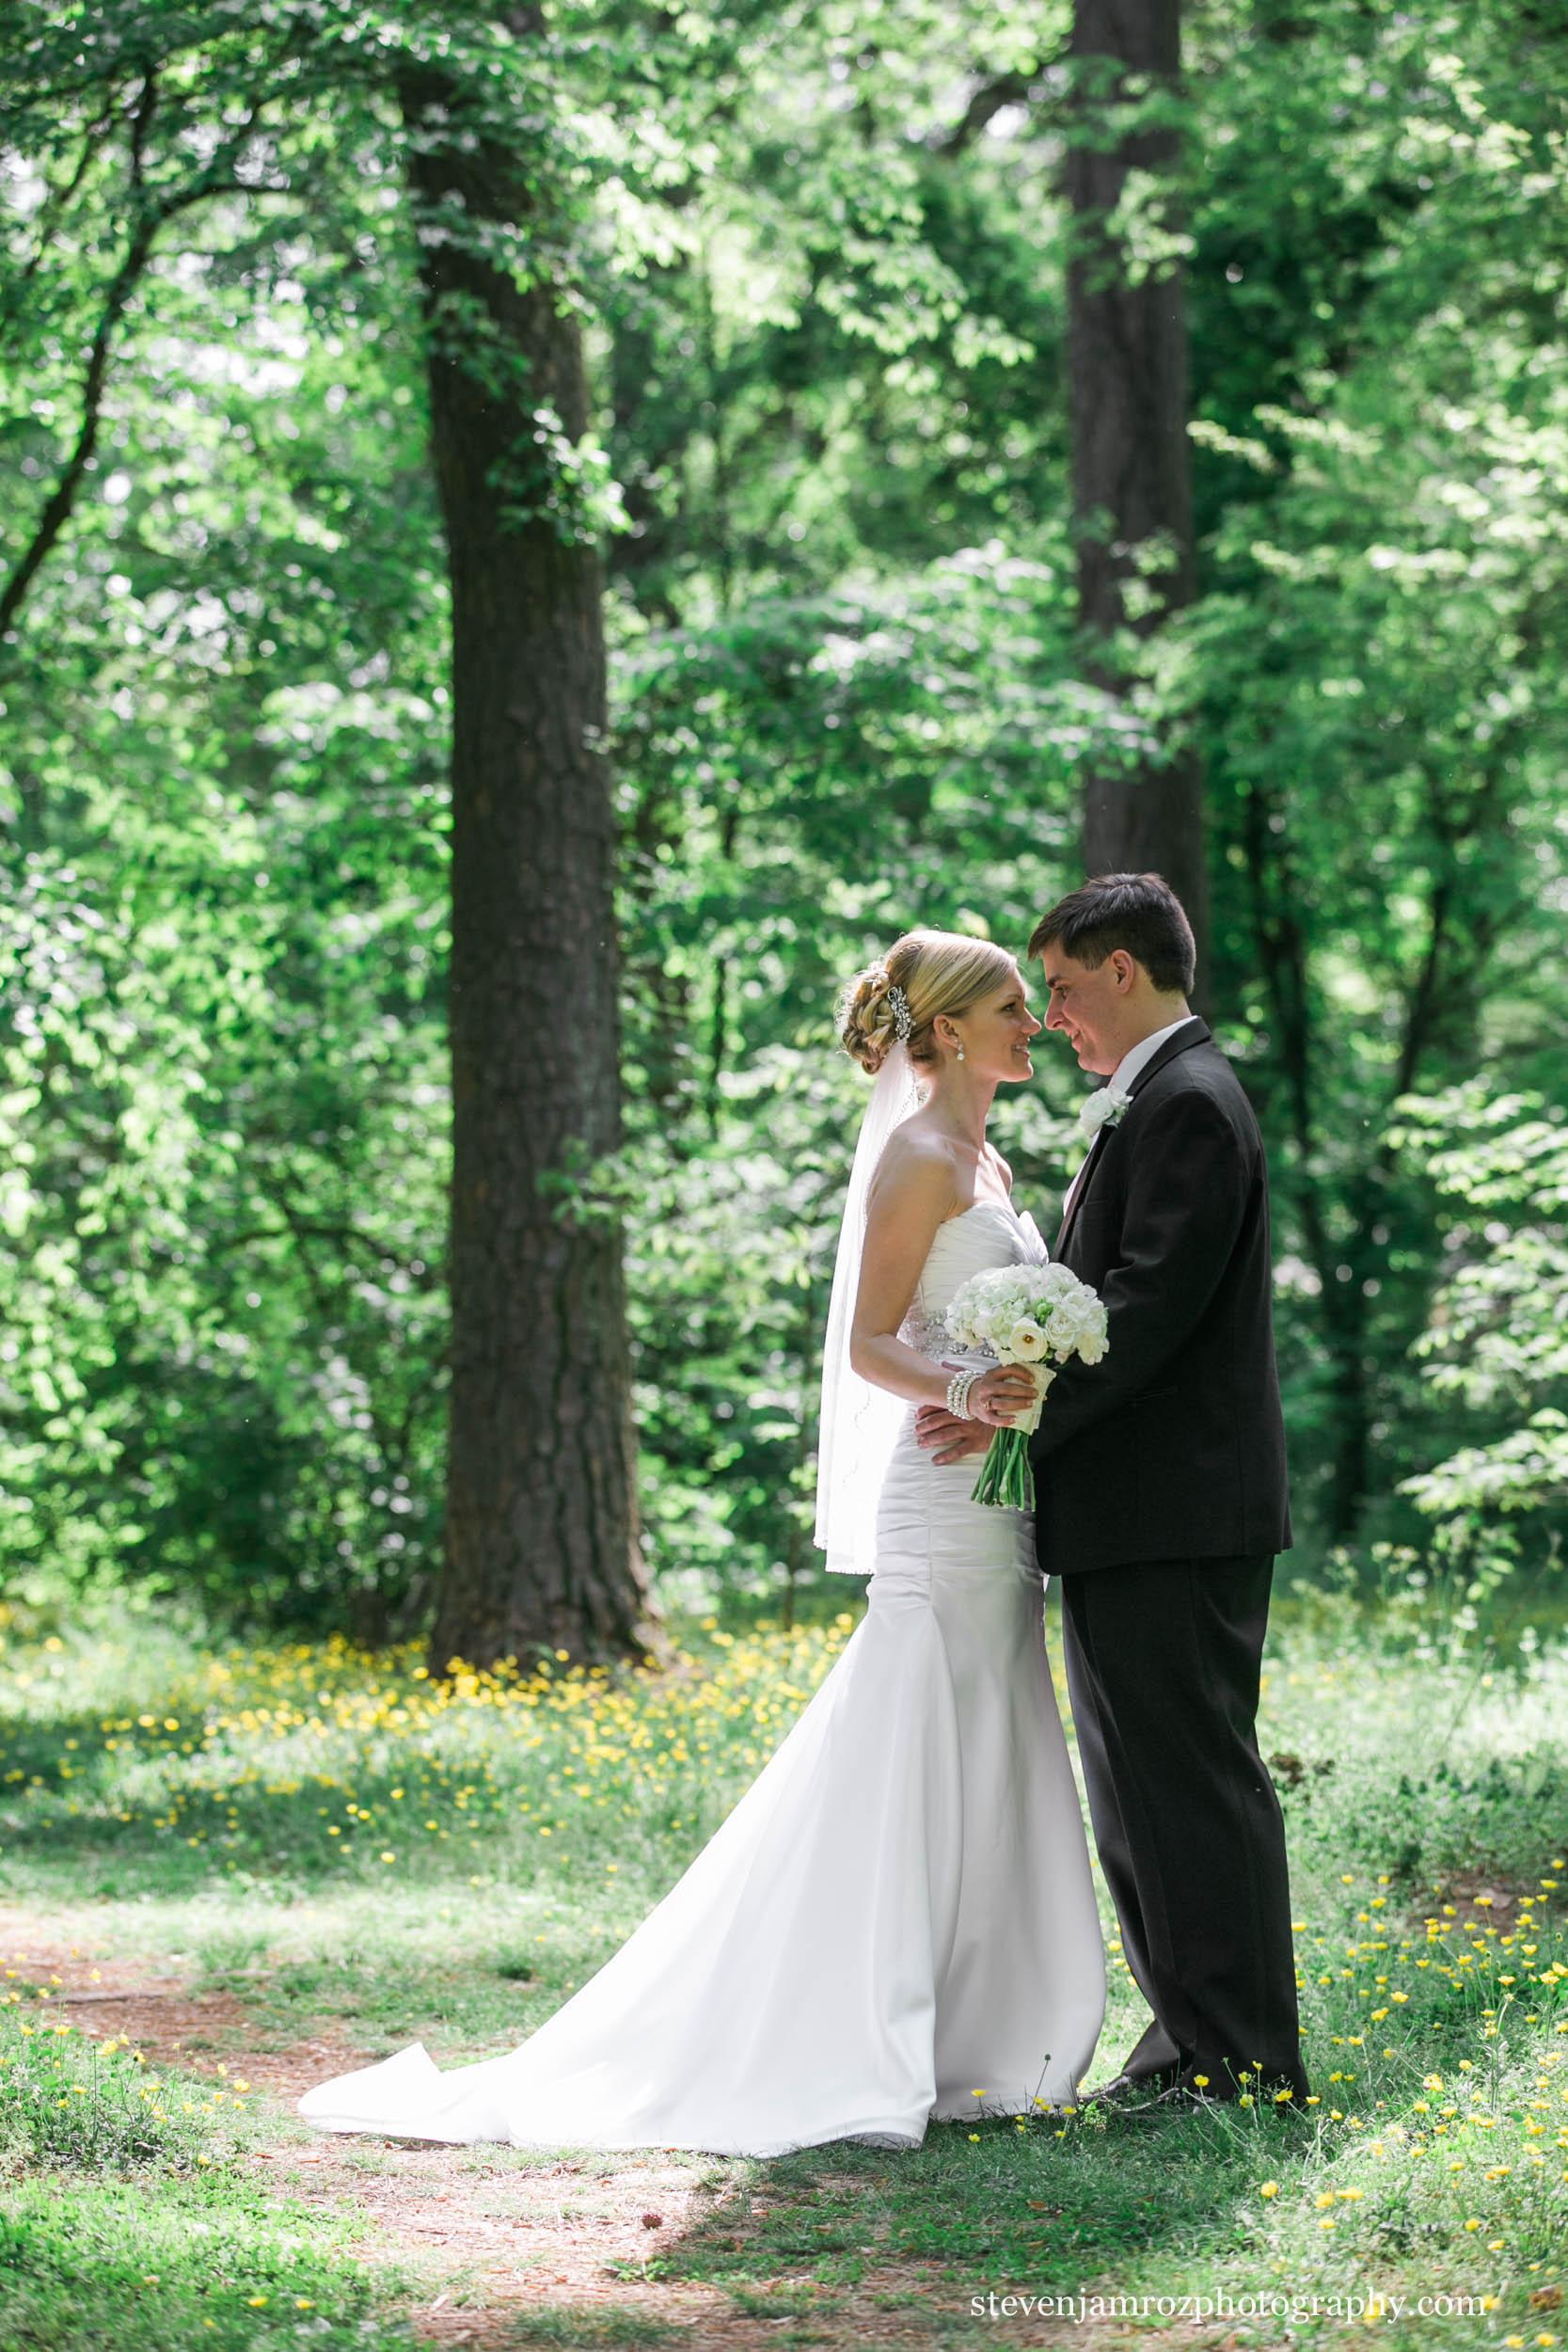 intimate-moment-couple-wedding-raleigh-steven-jamroz-photography-0306.jpg